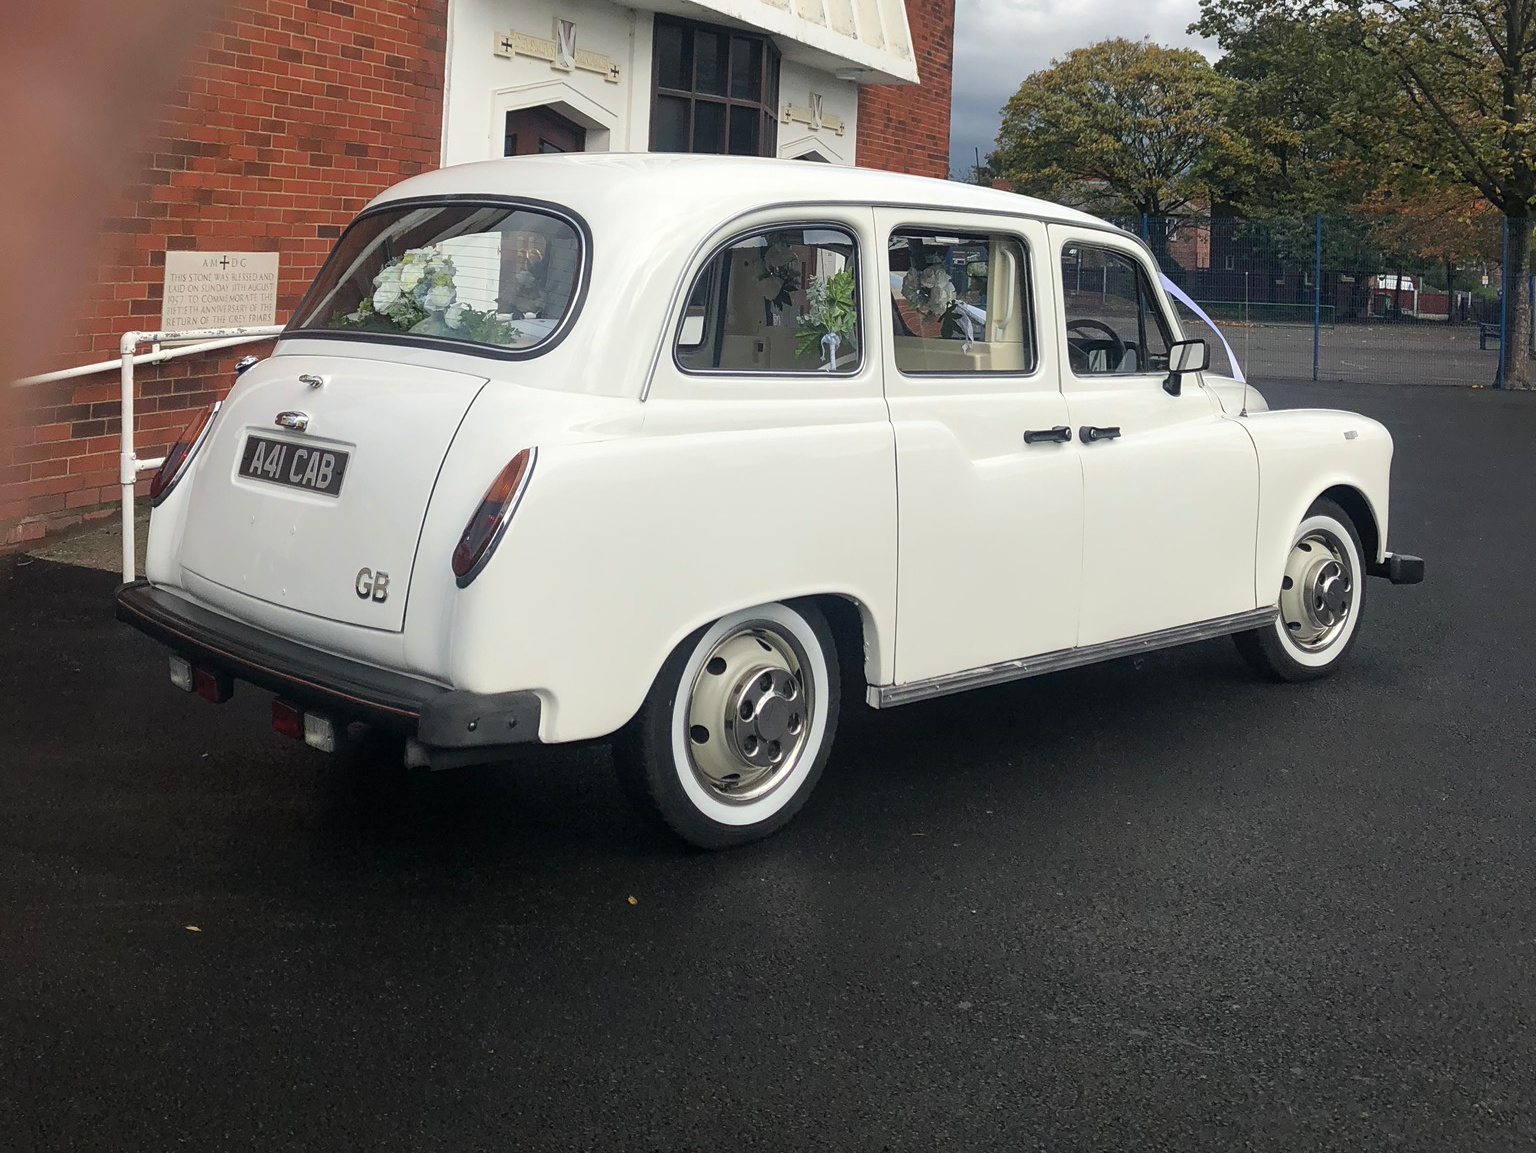 film prop wedding car wedding taxi prop